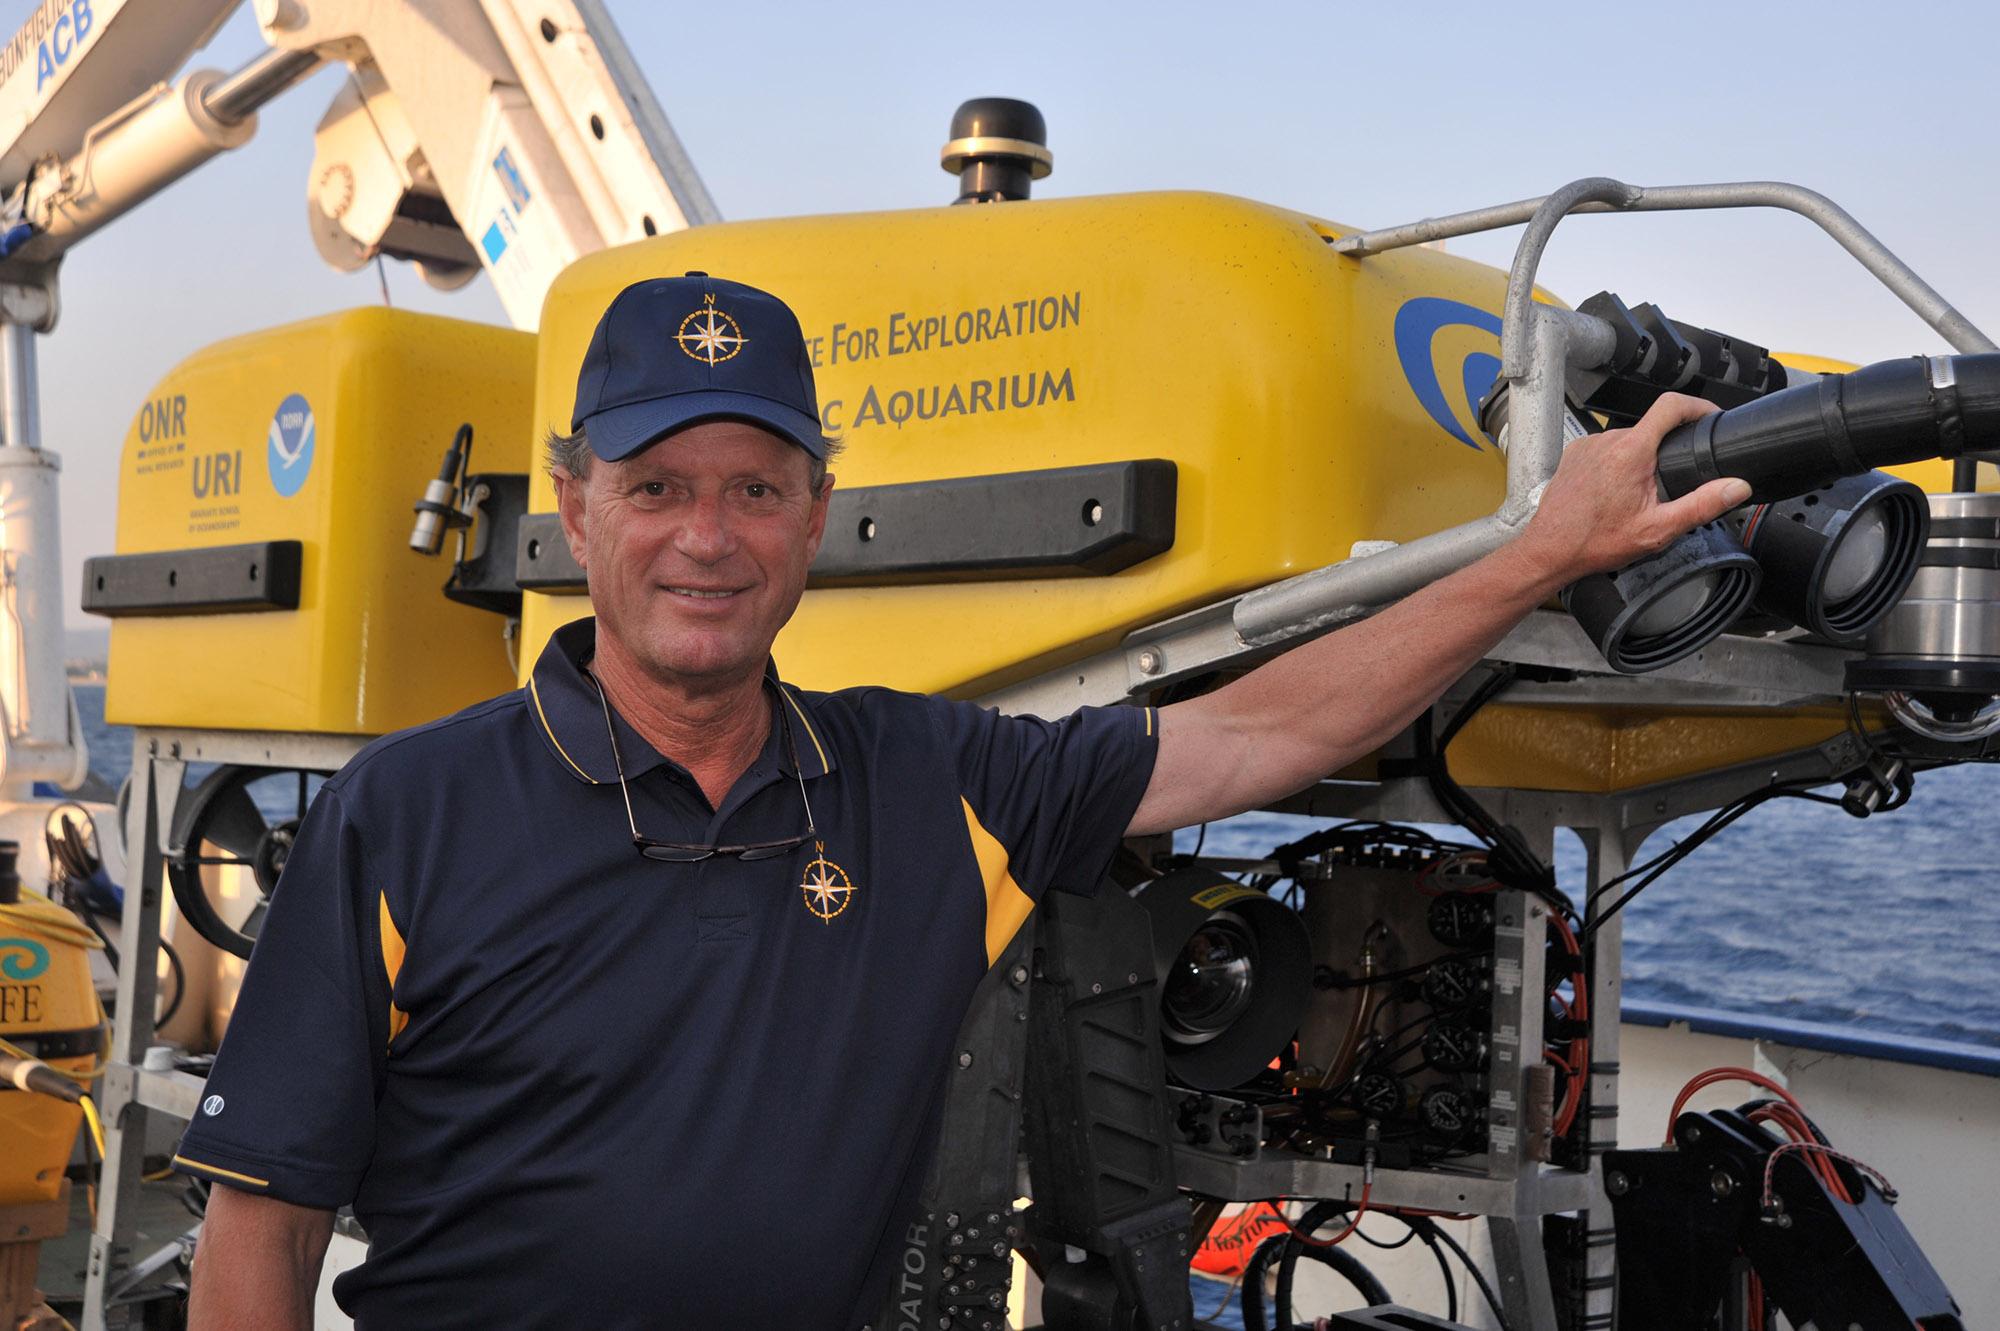 Oceanographer Robert Ballard